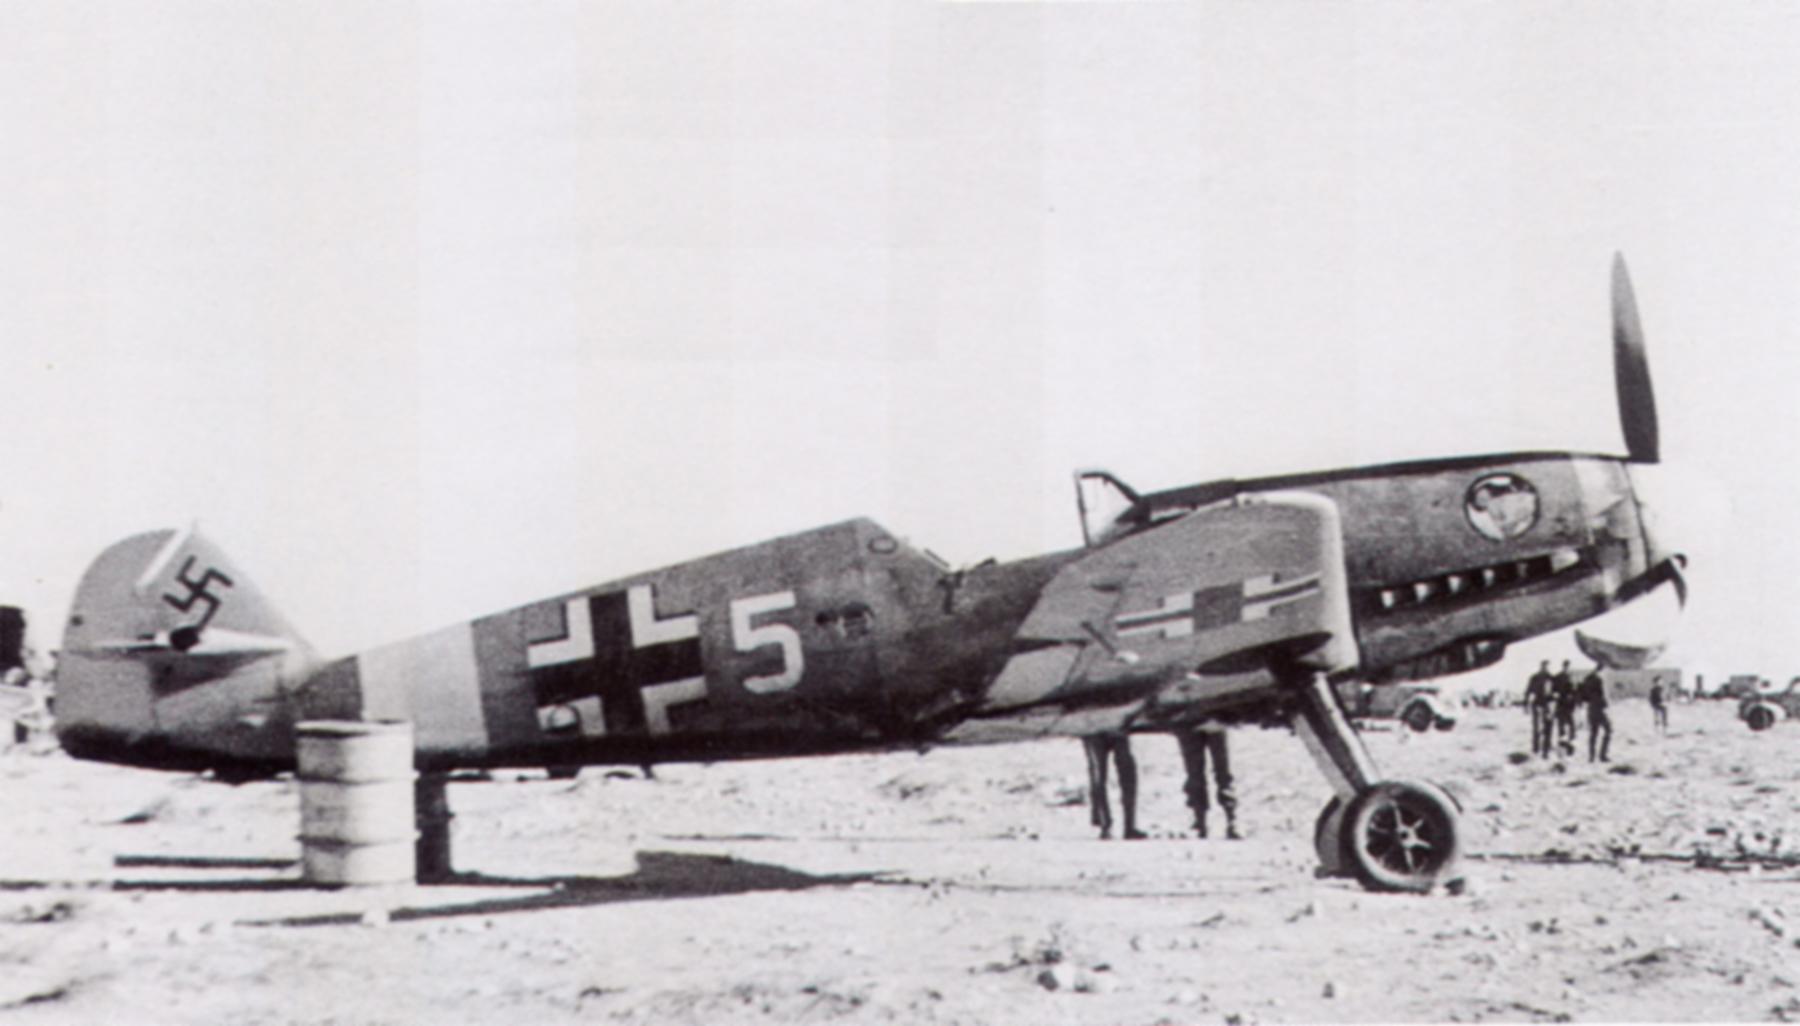 Messerschmitt Bf 109F4Trop 1.JG27 White 5 Albert Espenlaub crash landed El Adem Dec 1941 01